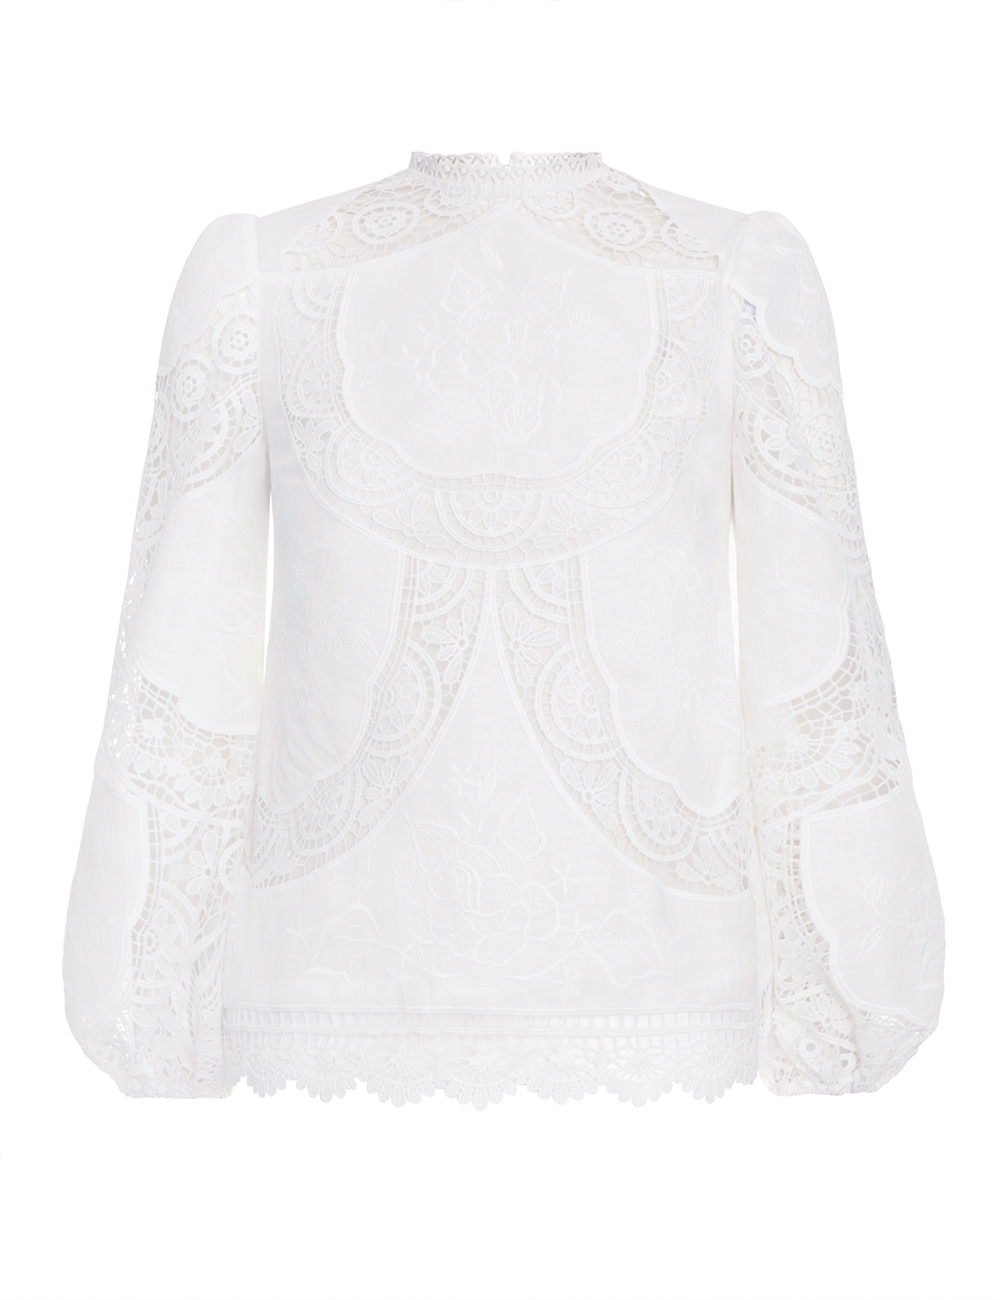 Bonita Crochet Embroidery Top